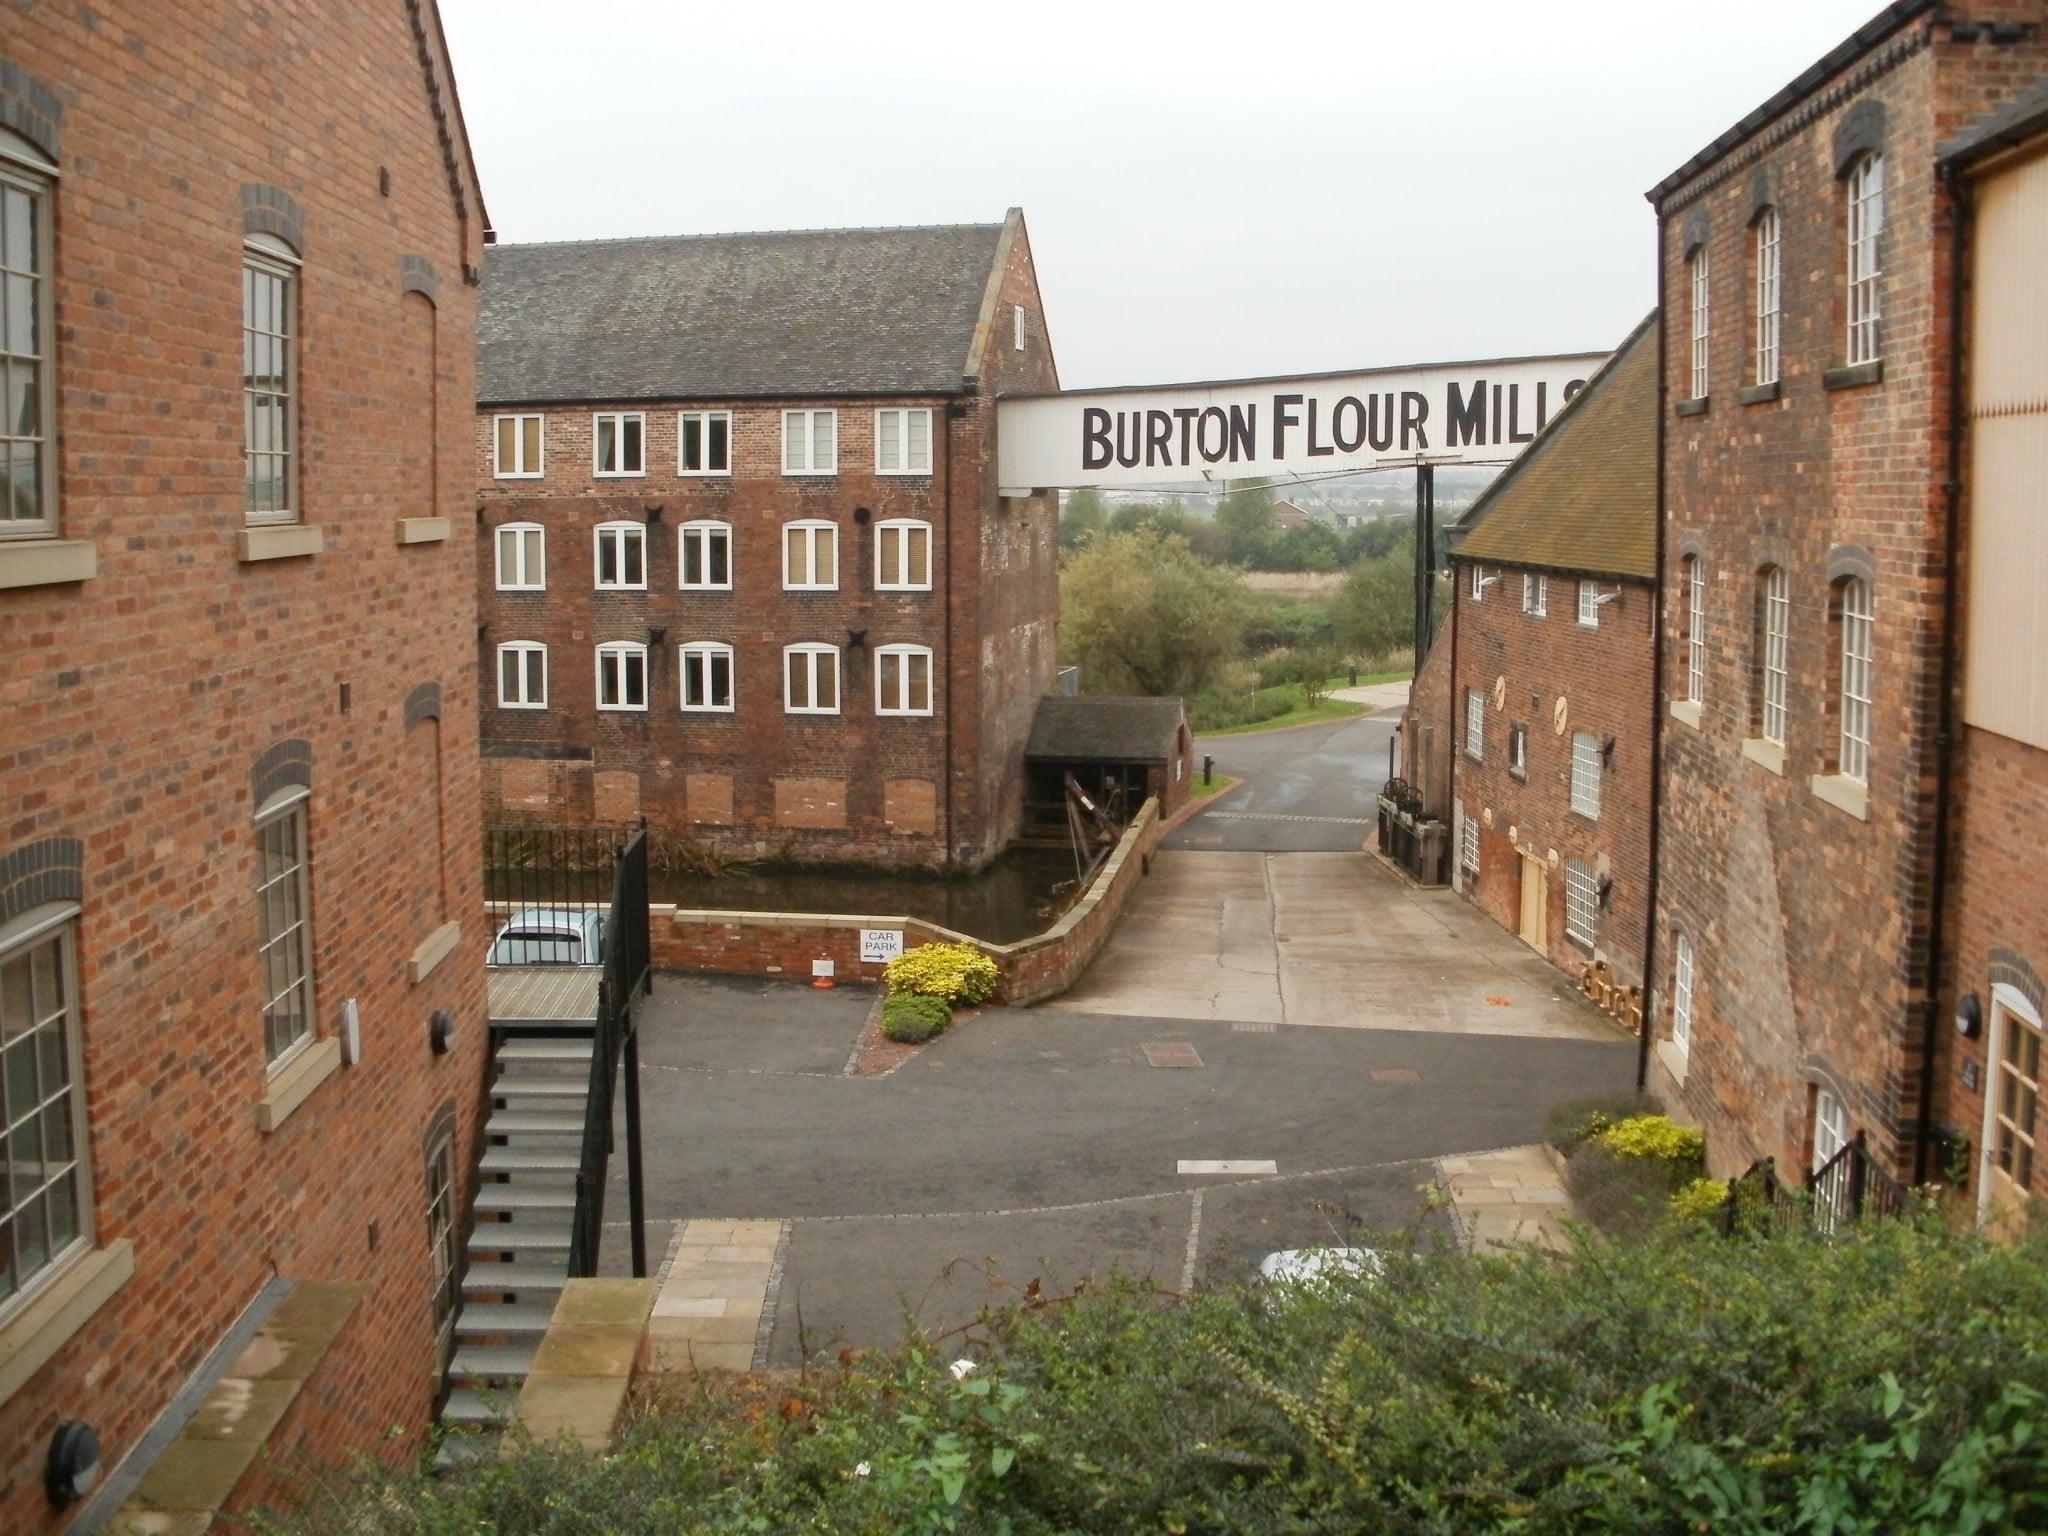 Sir Robert Peel (1st Baronet) site of the original mill